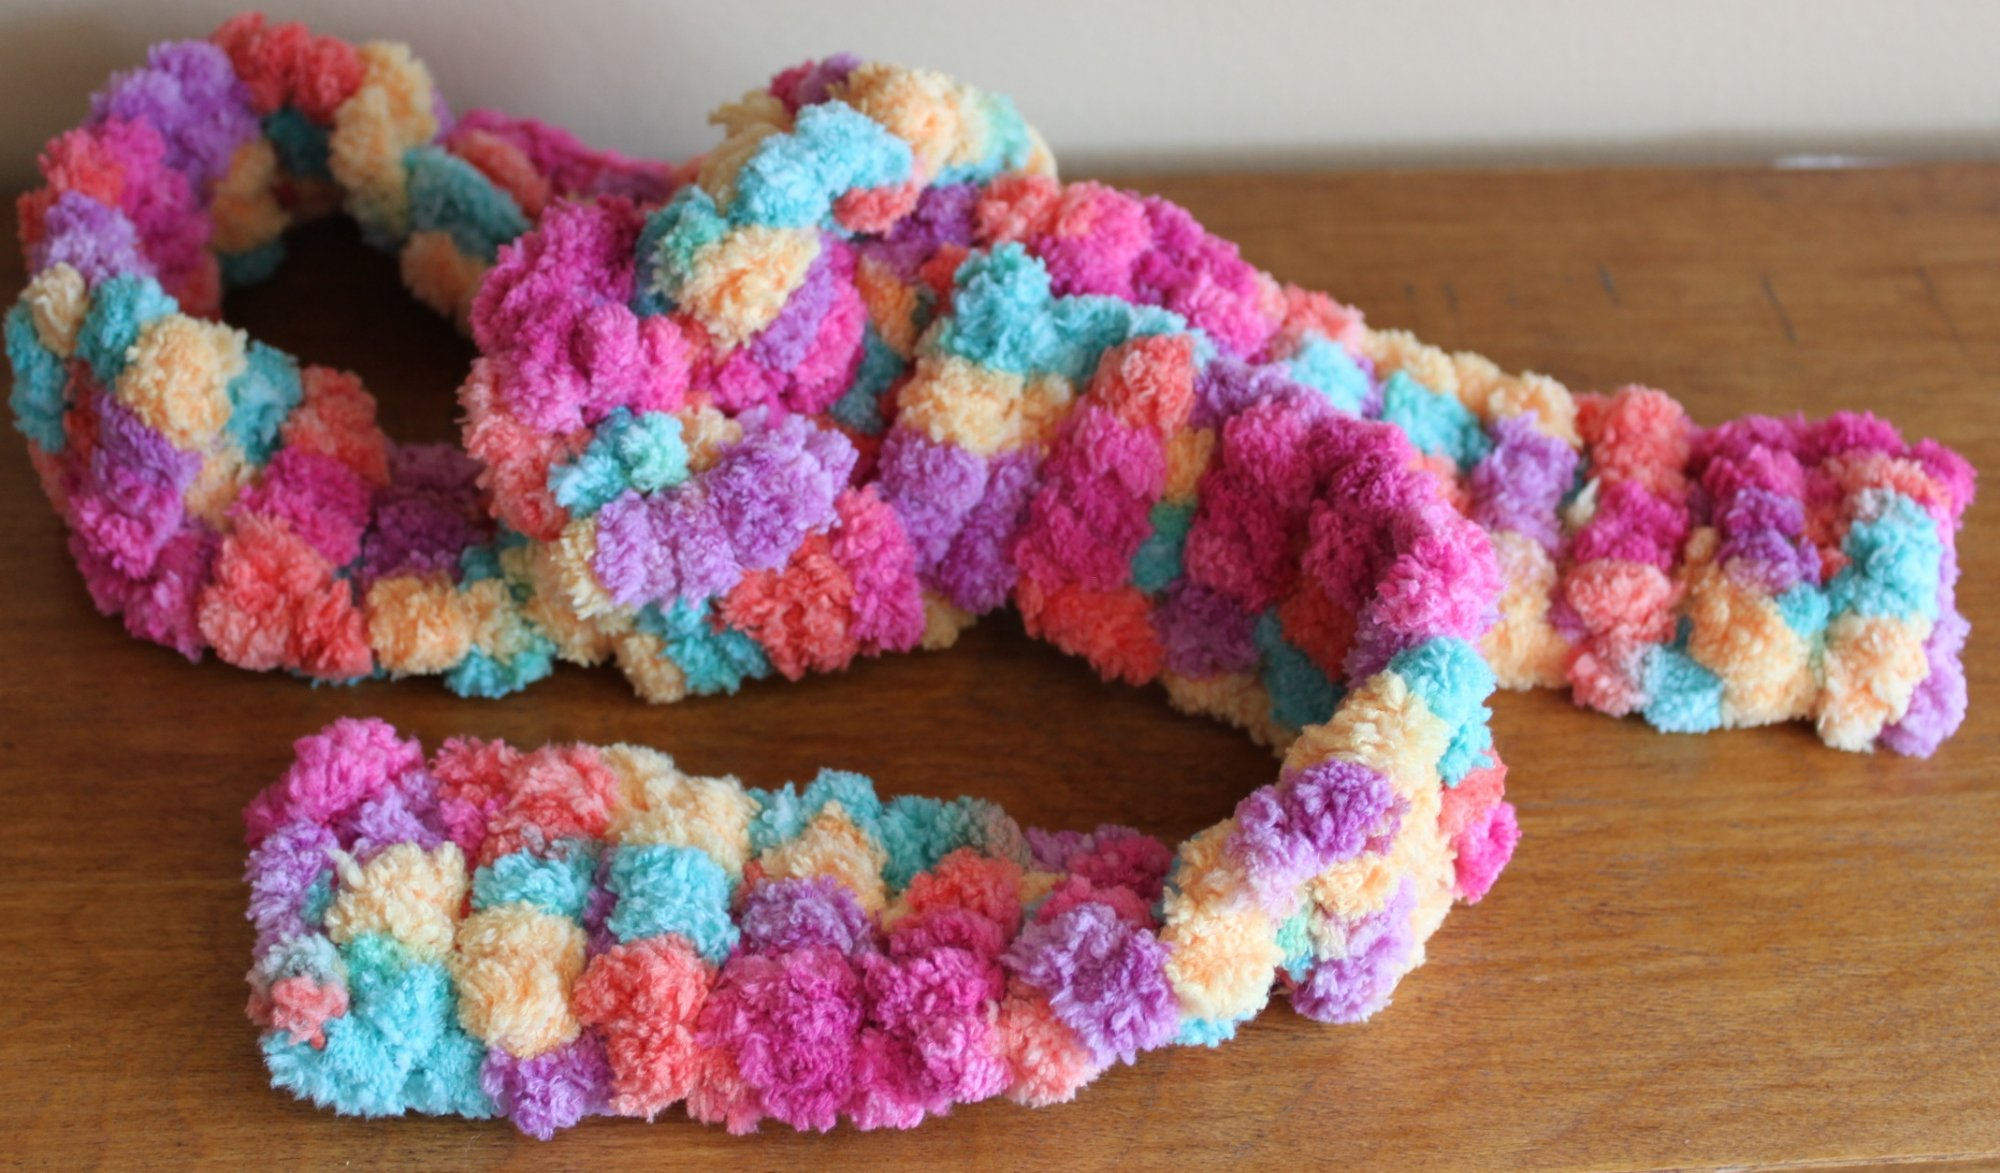 Multi-color puffy scarf - small child